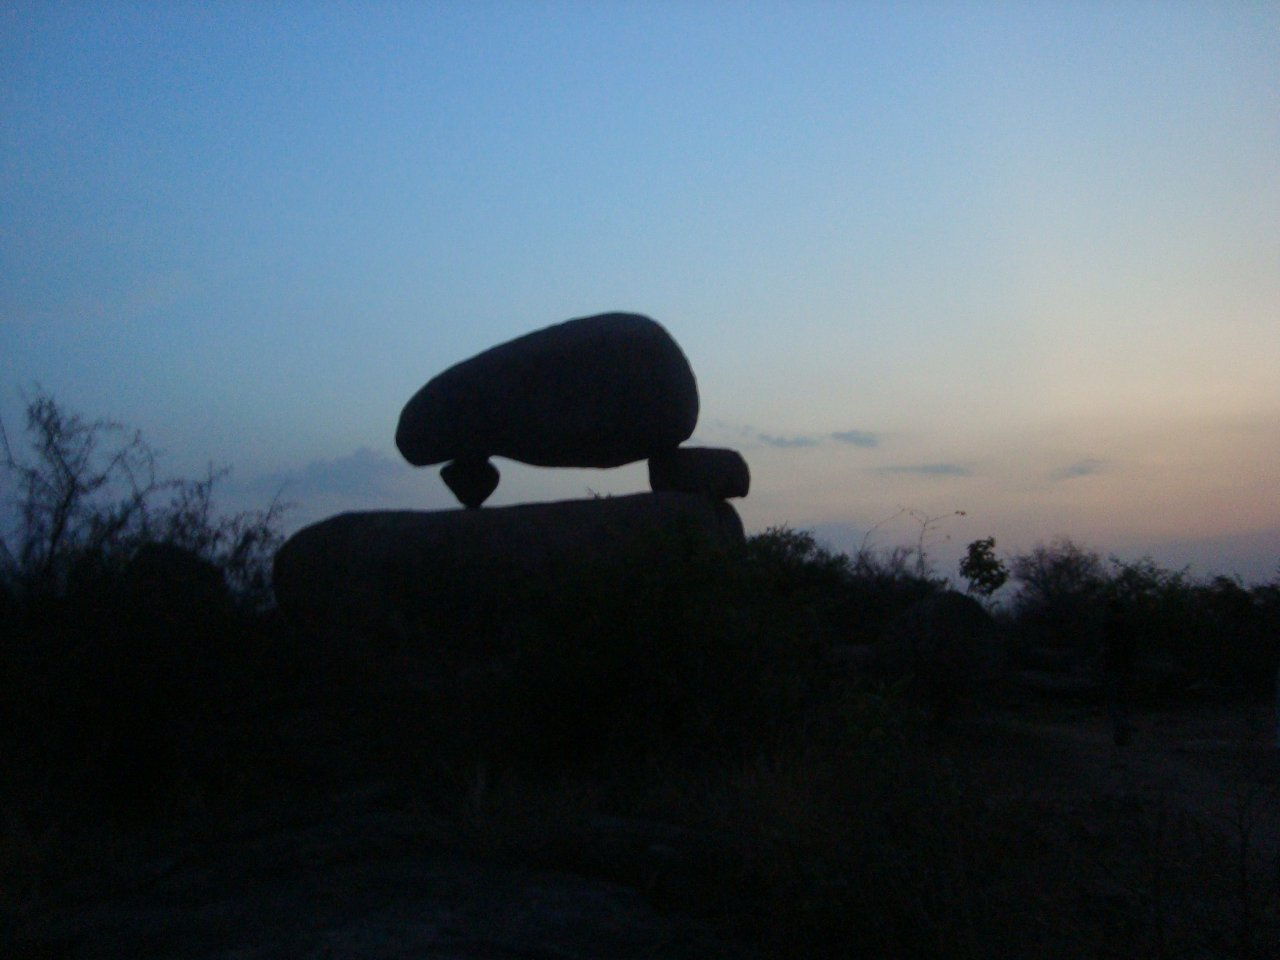 Mushroom or Santro Rock